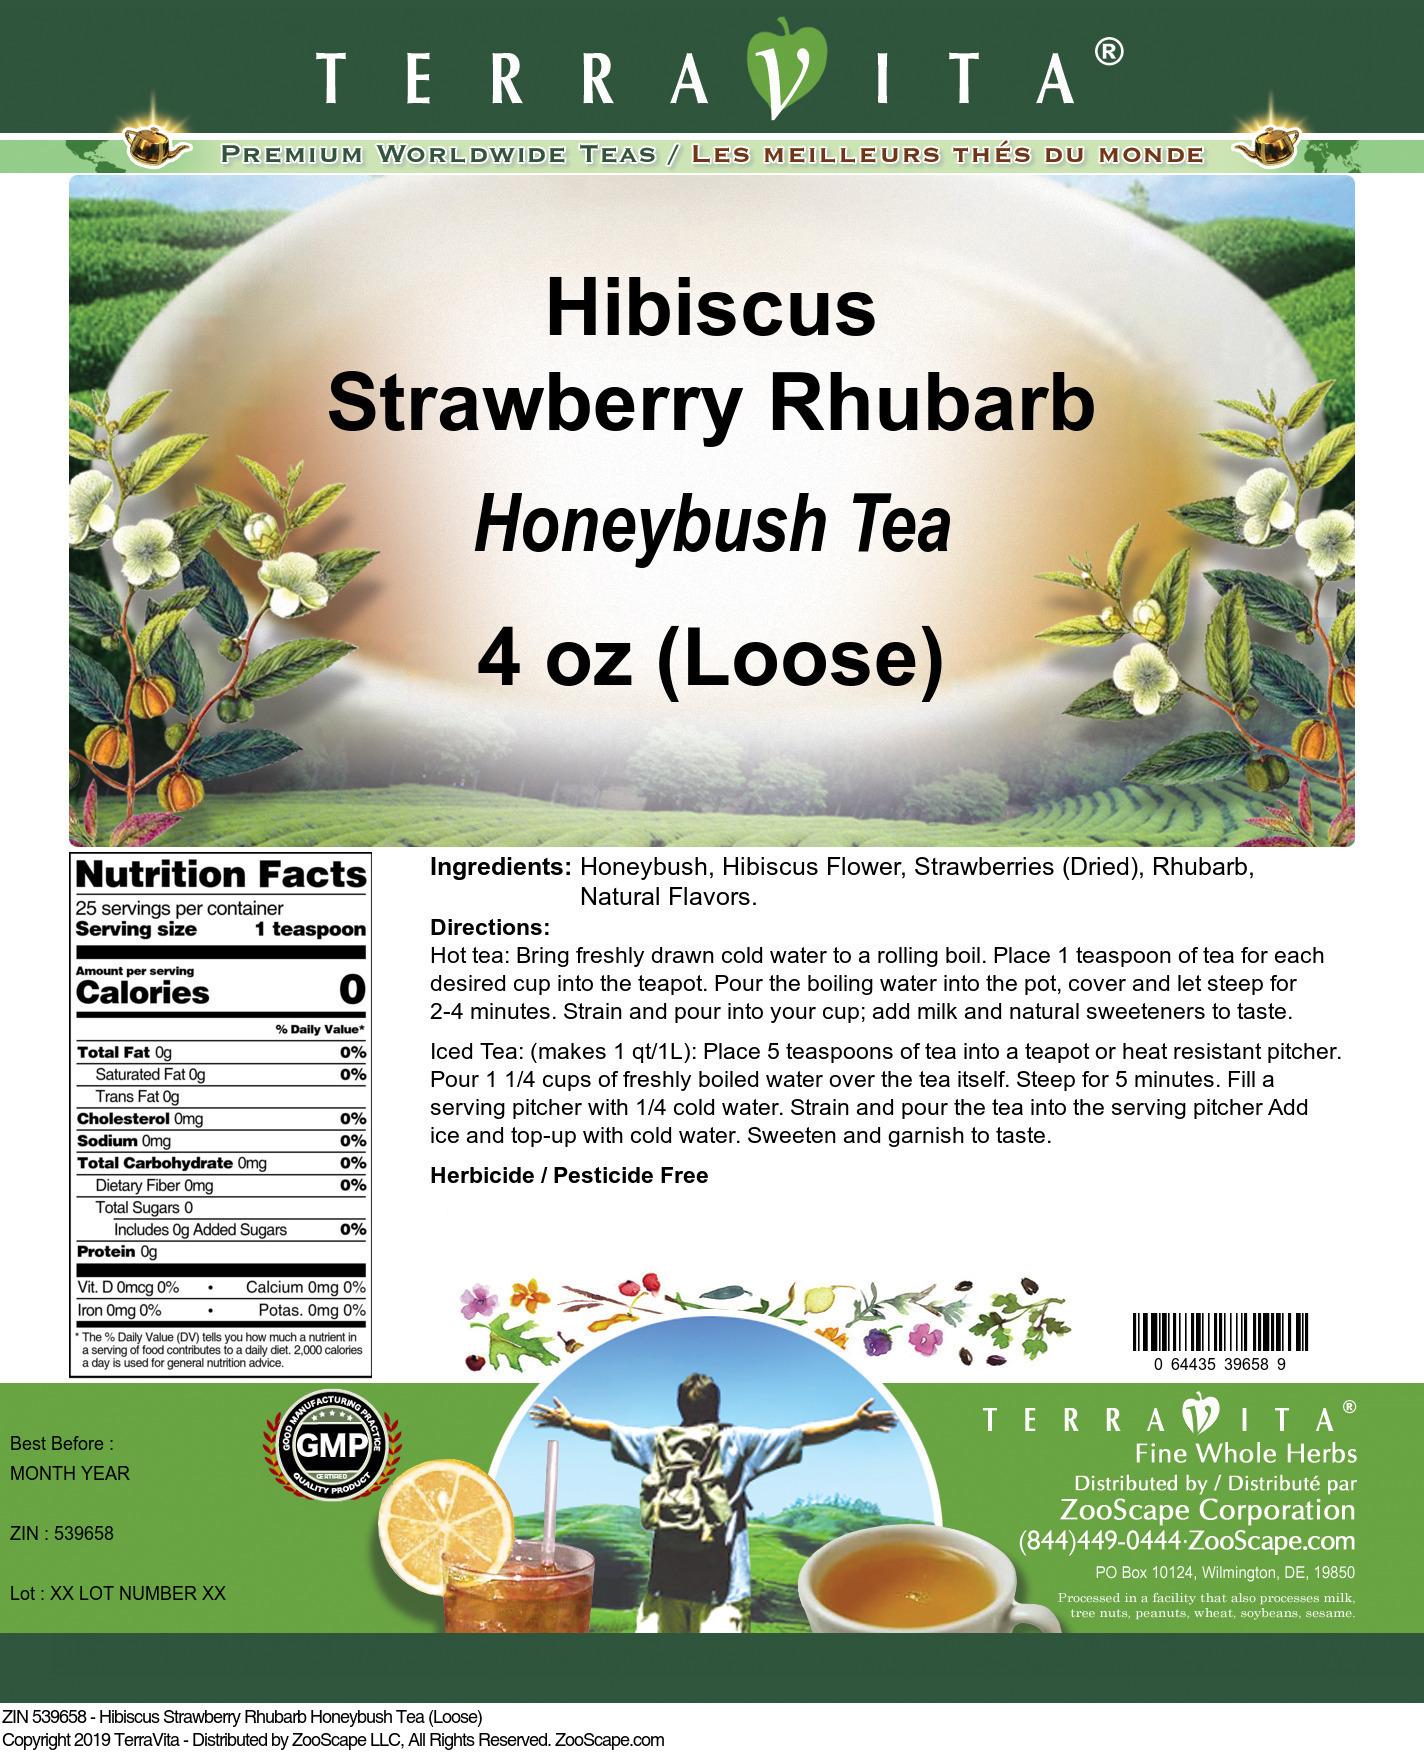 Hibiscus Strawberry Rhubarb Honeybush Tea (Loose)